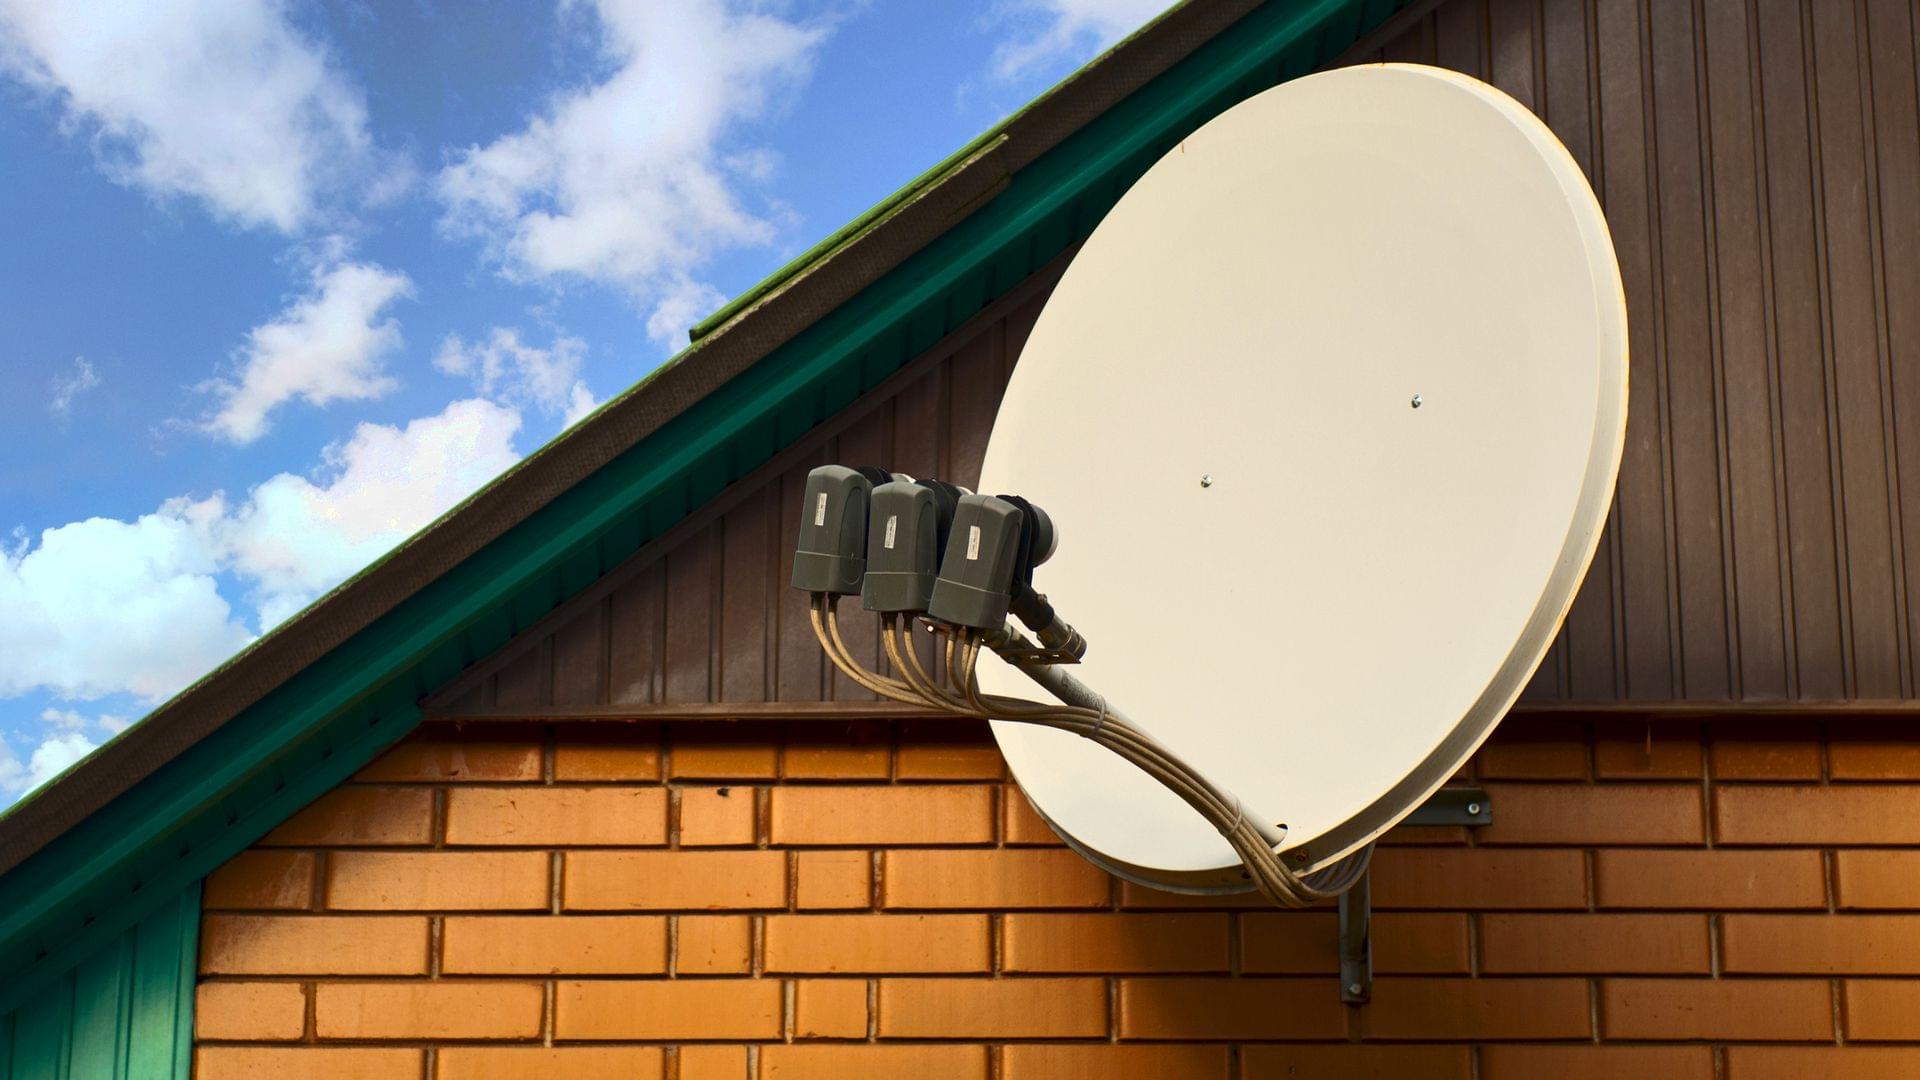 Montaż anten Łódź - Najlepsi w 2020